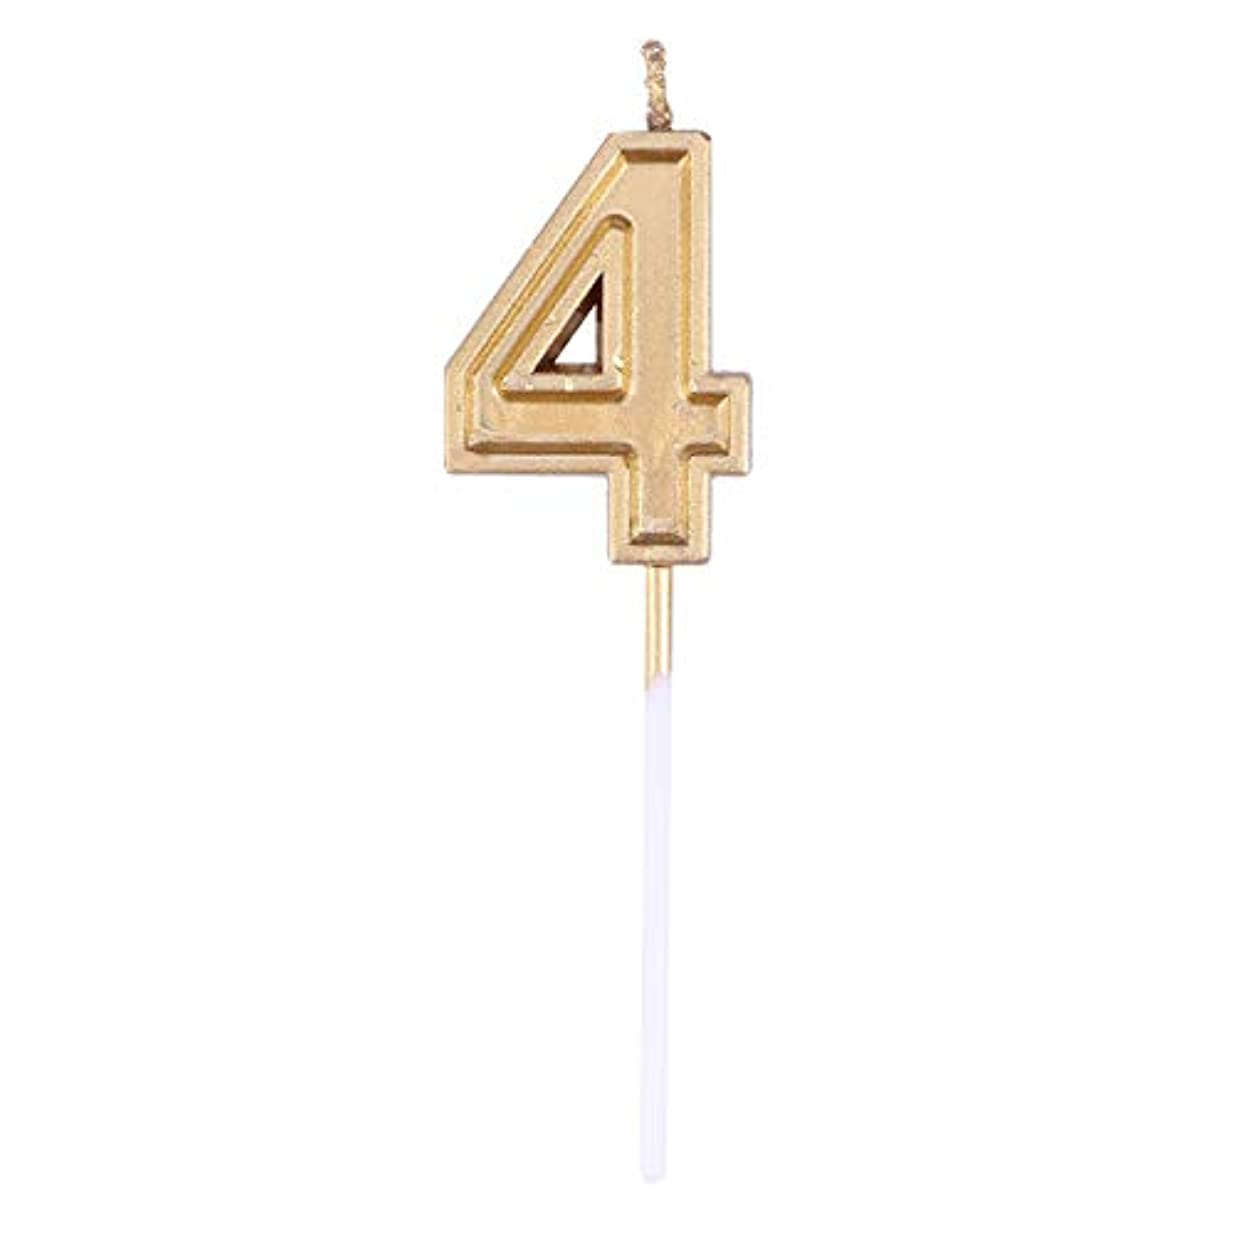 Toyvian ゴールドラメ誕生日おめでとう数字キャンドル番号キャンドルケーキトッパー装飾用大人キッズパーティー(番号4)